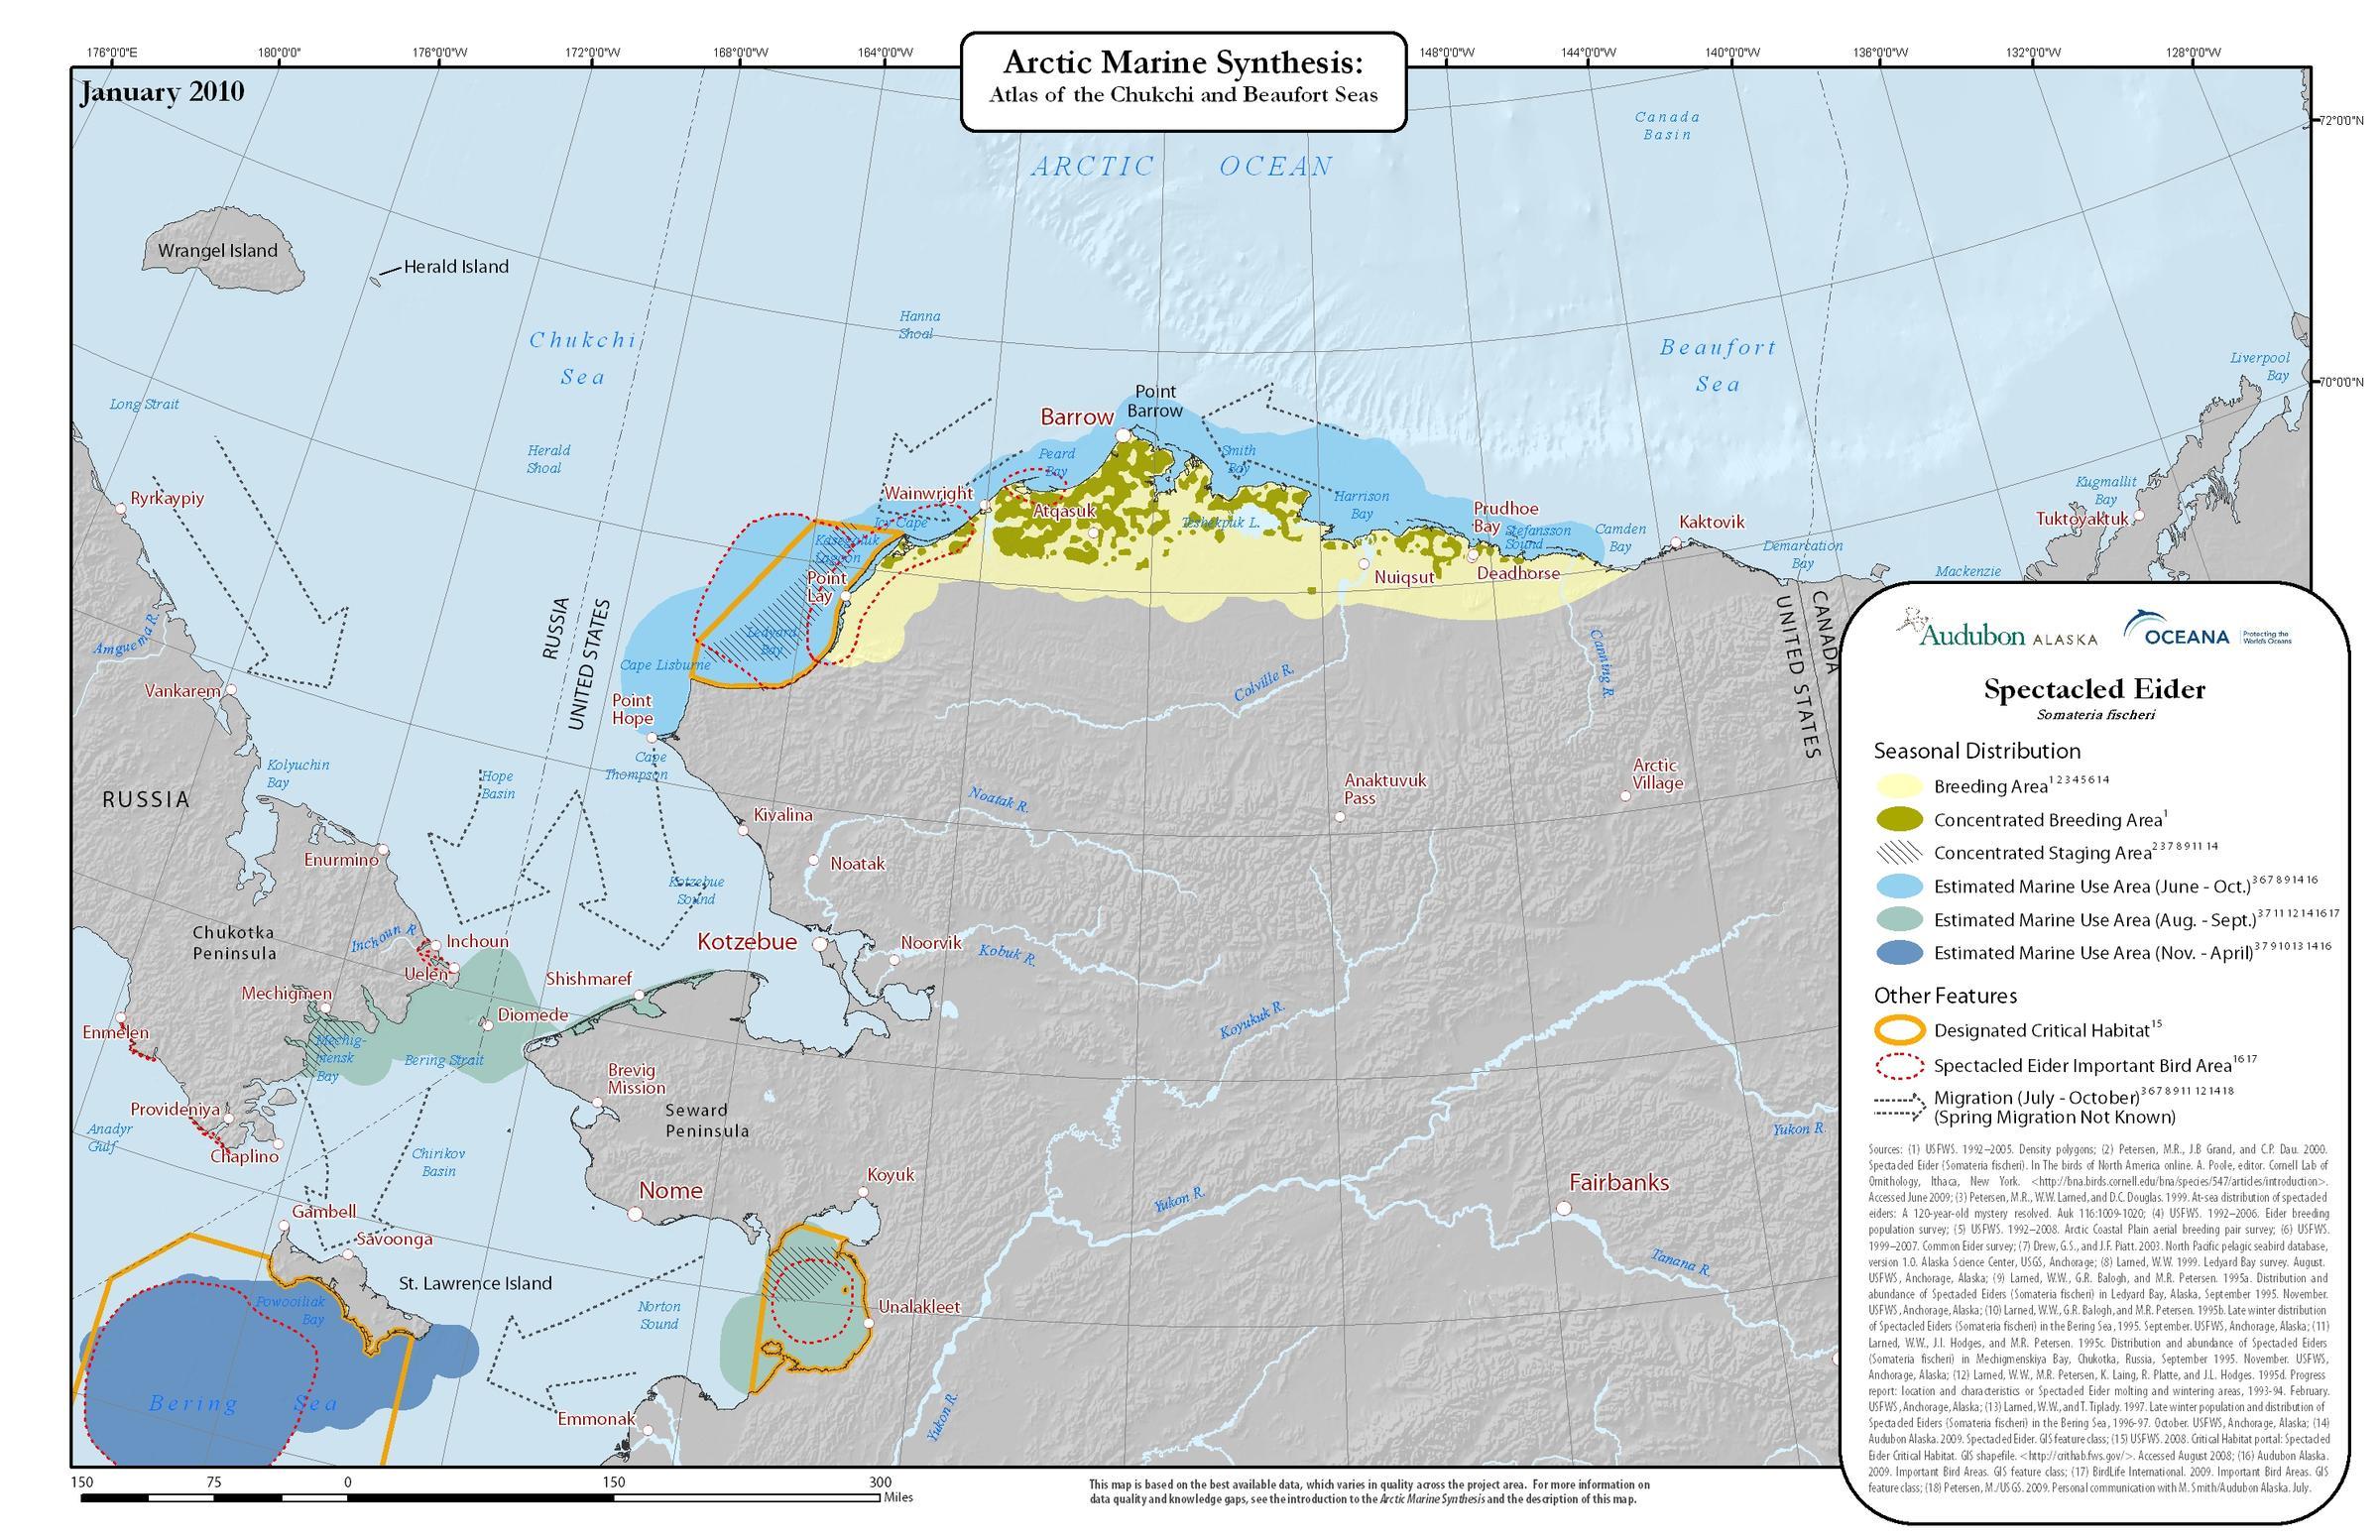 Arctic Marine Atlas Spectacled Eider map